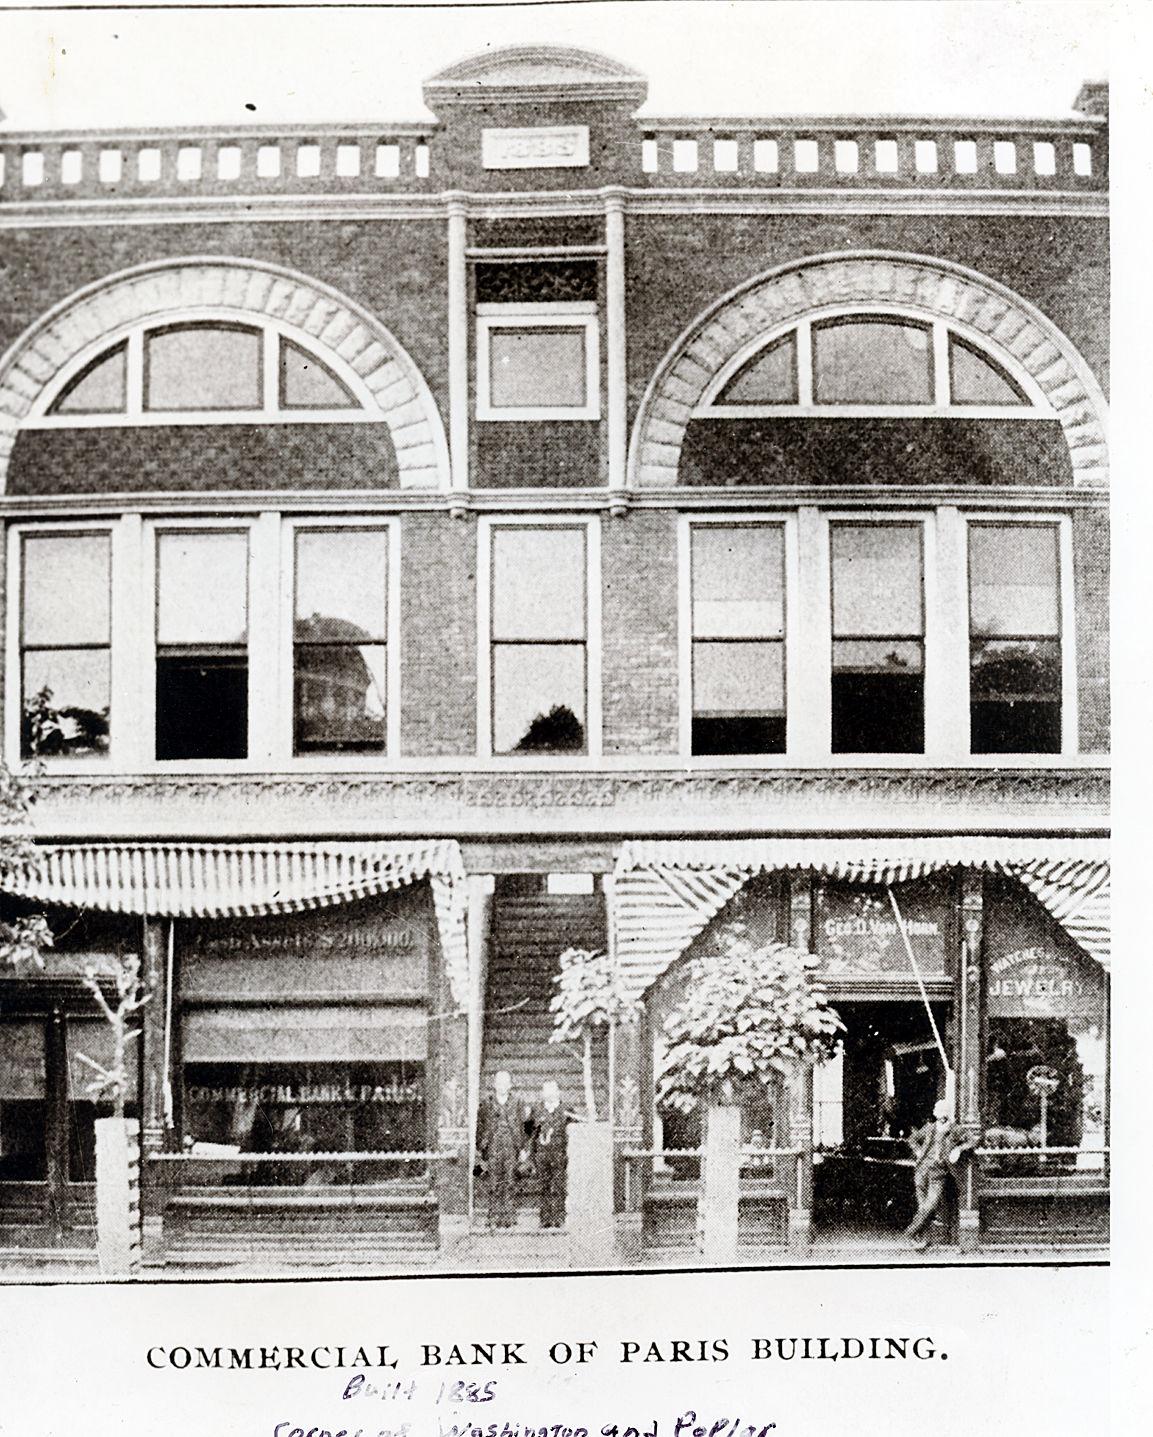 8-16-18 PG1 Commercial Bank PIC 3C.jpg